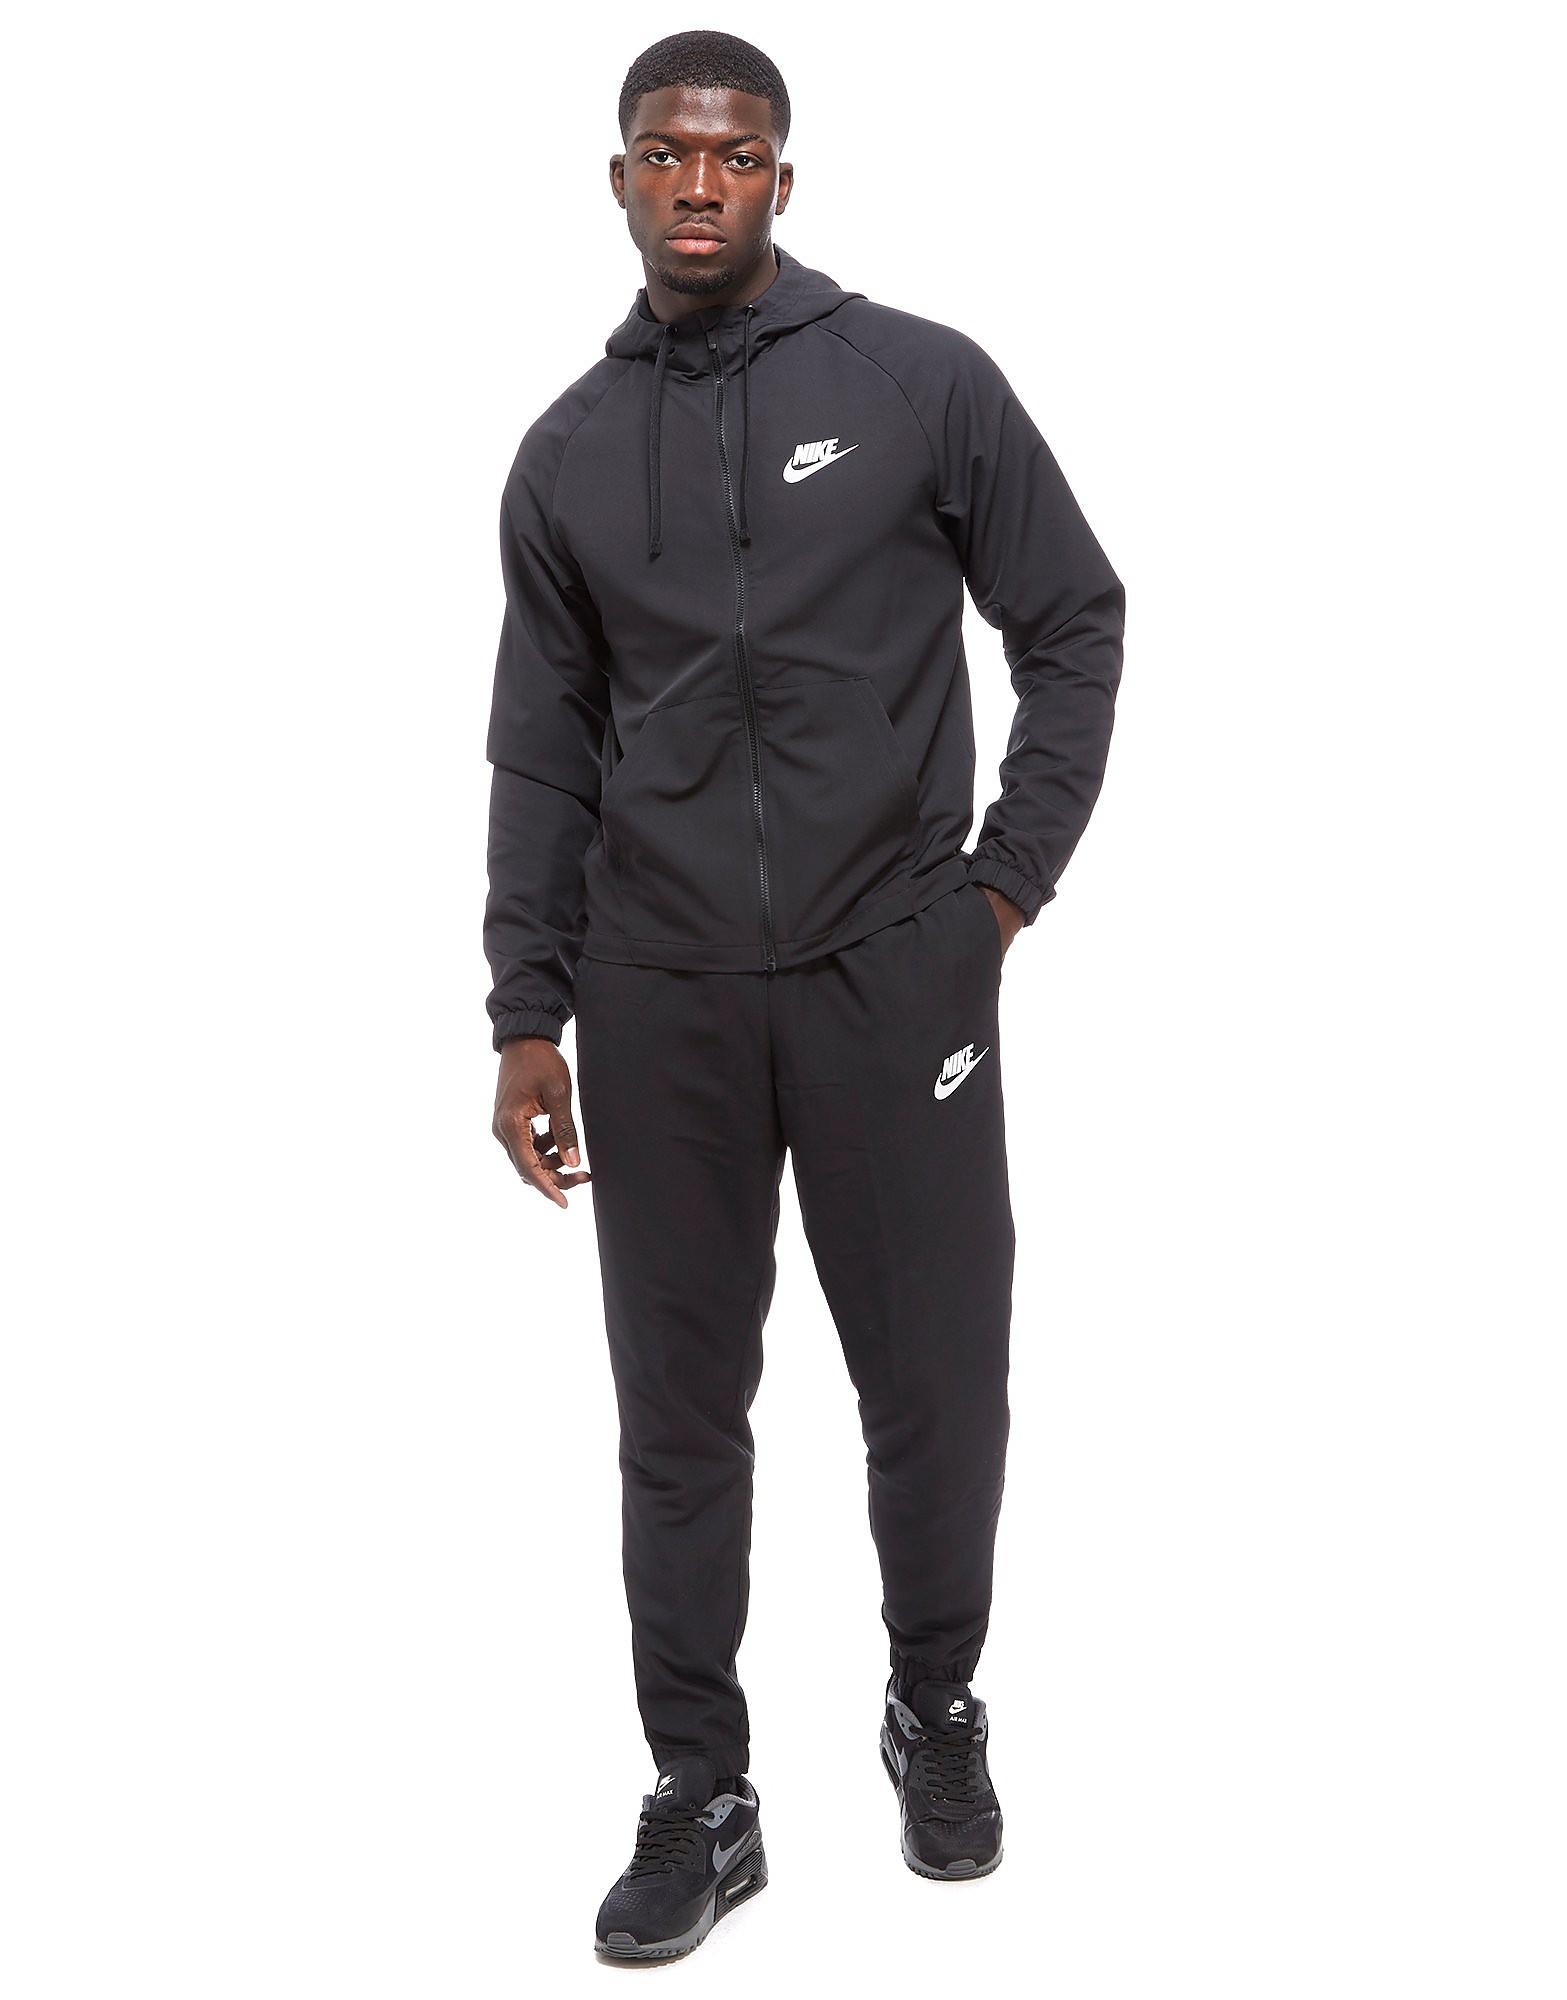 Nike Shut Out 2 Tuta